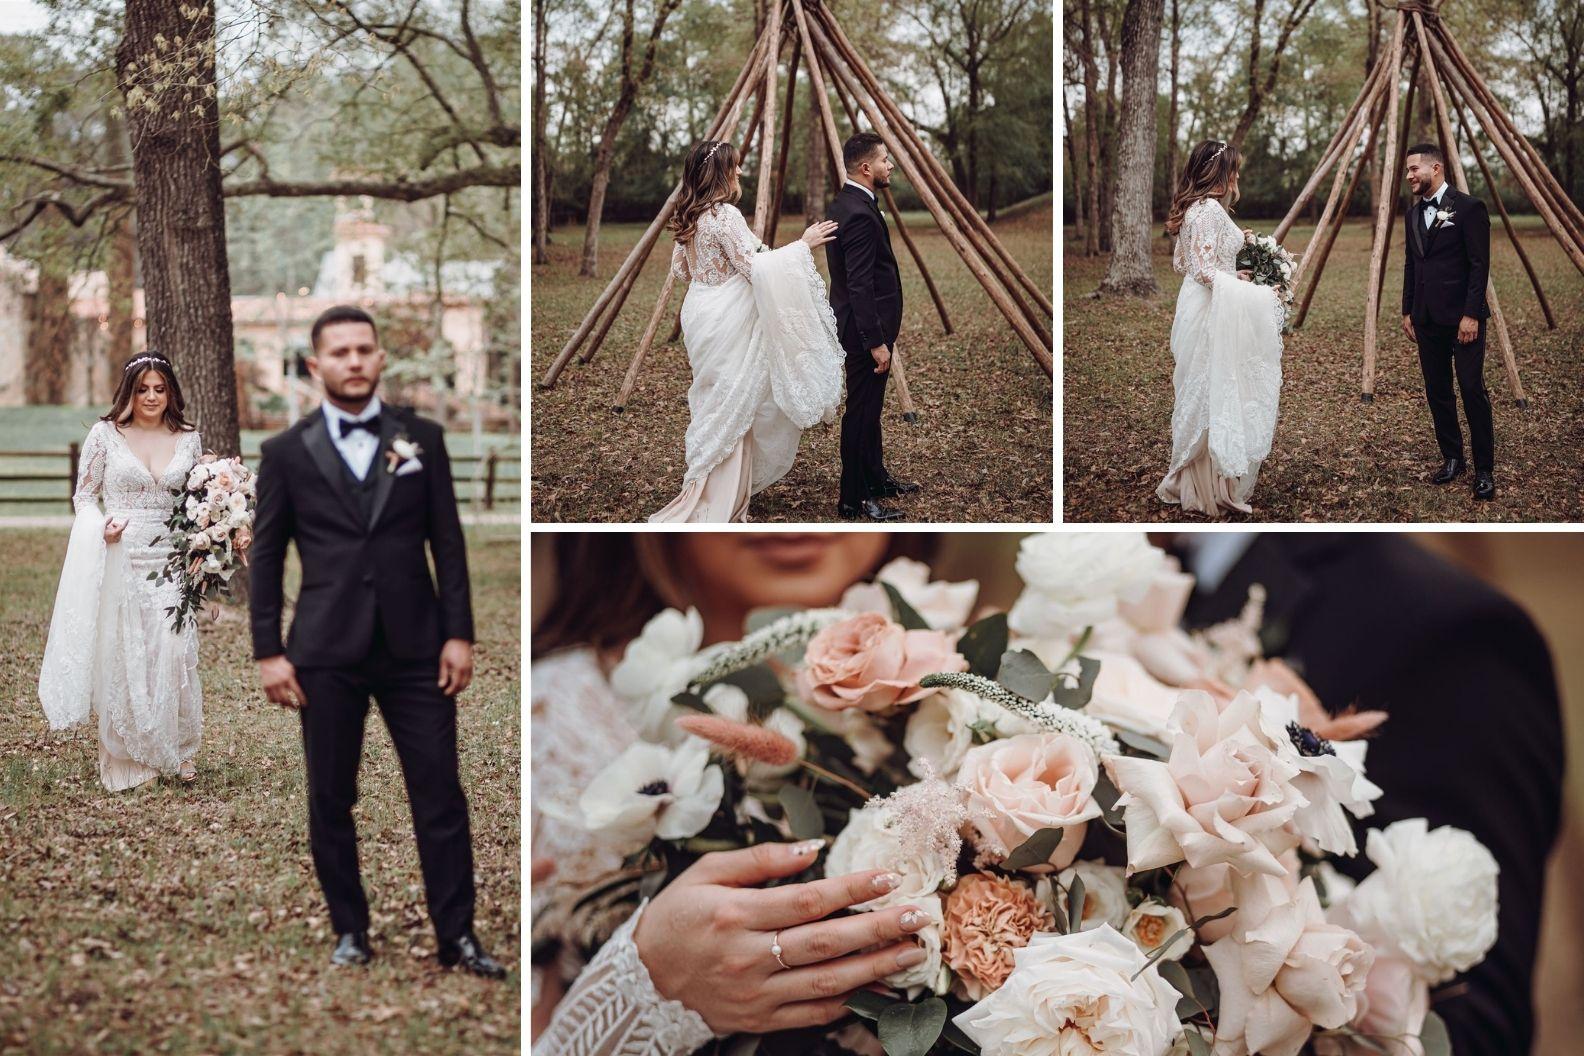 7 Samantha and Mario - Madera Estates Conroe Texas - Twilight Evening Outdoor Ceremony